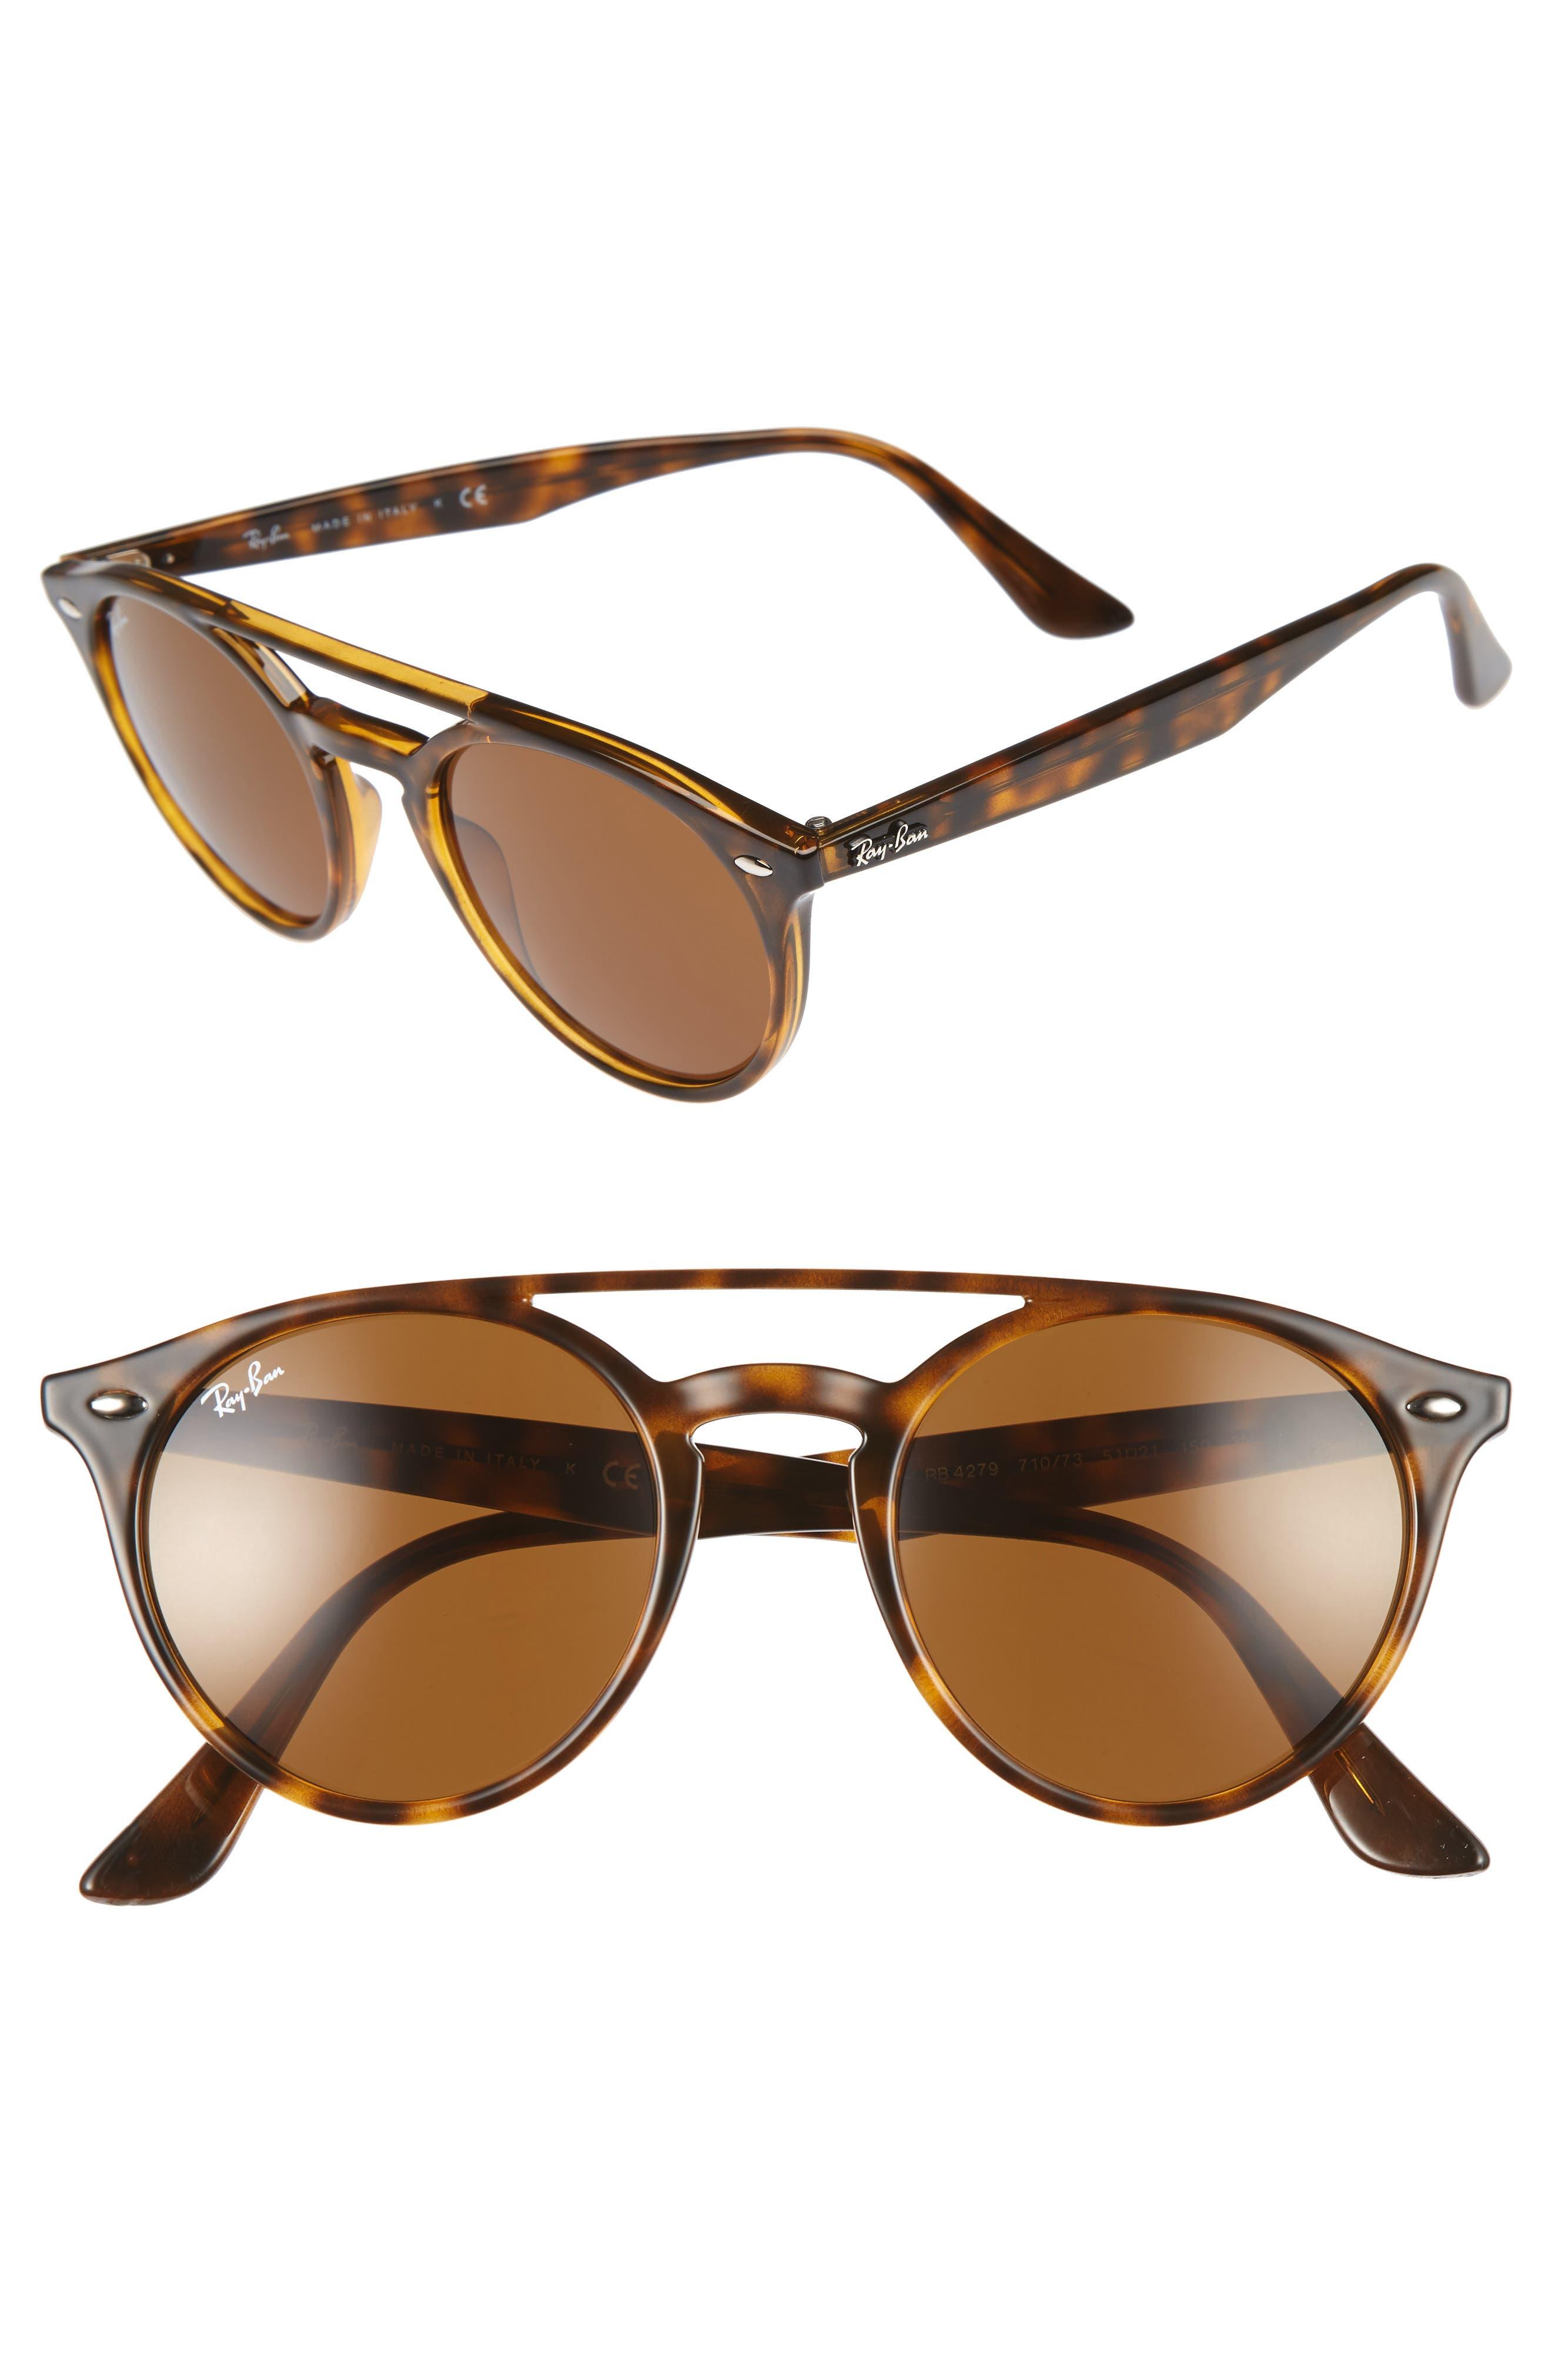 51mm Sunglasses,                         Main,                         color, 200